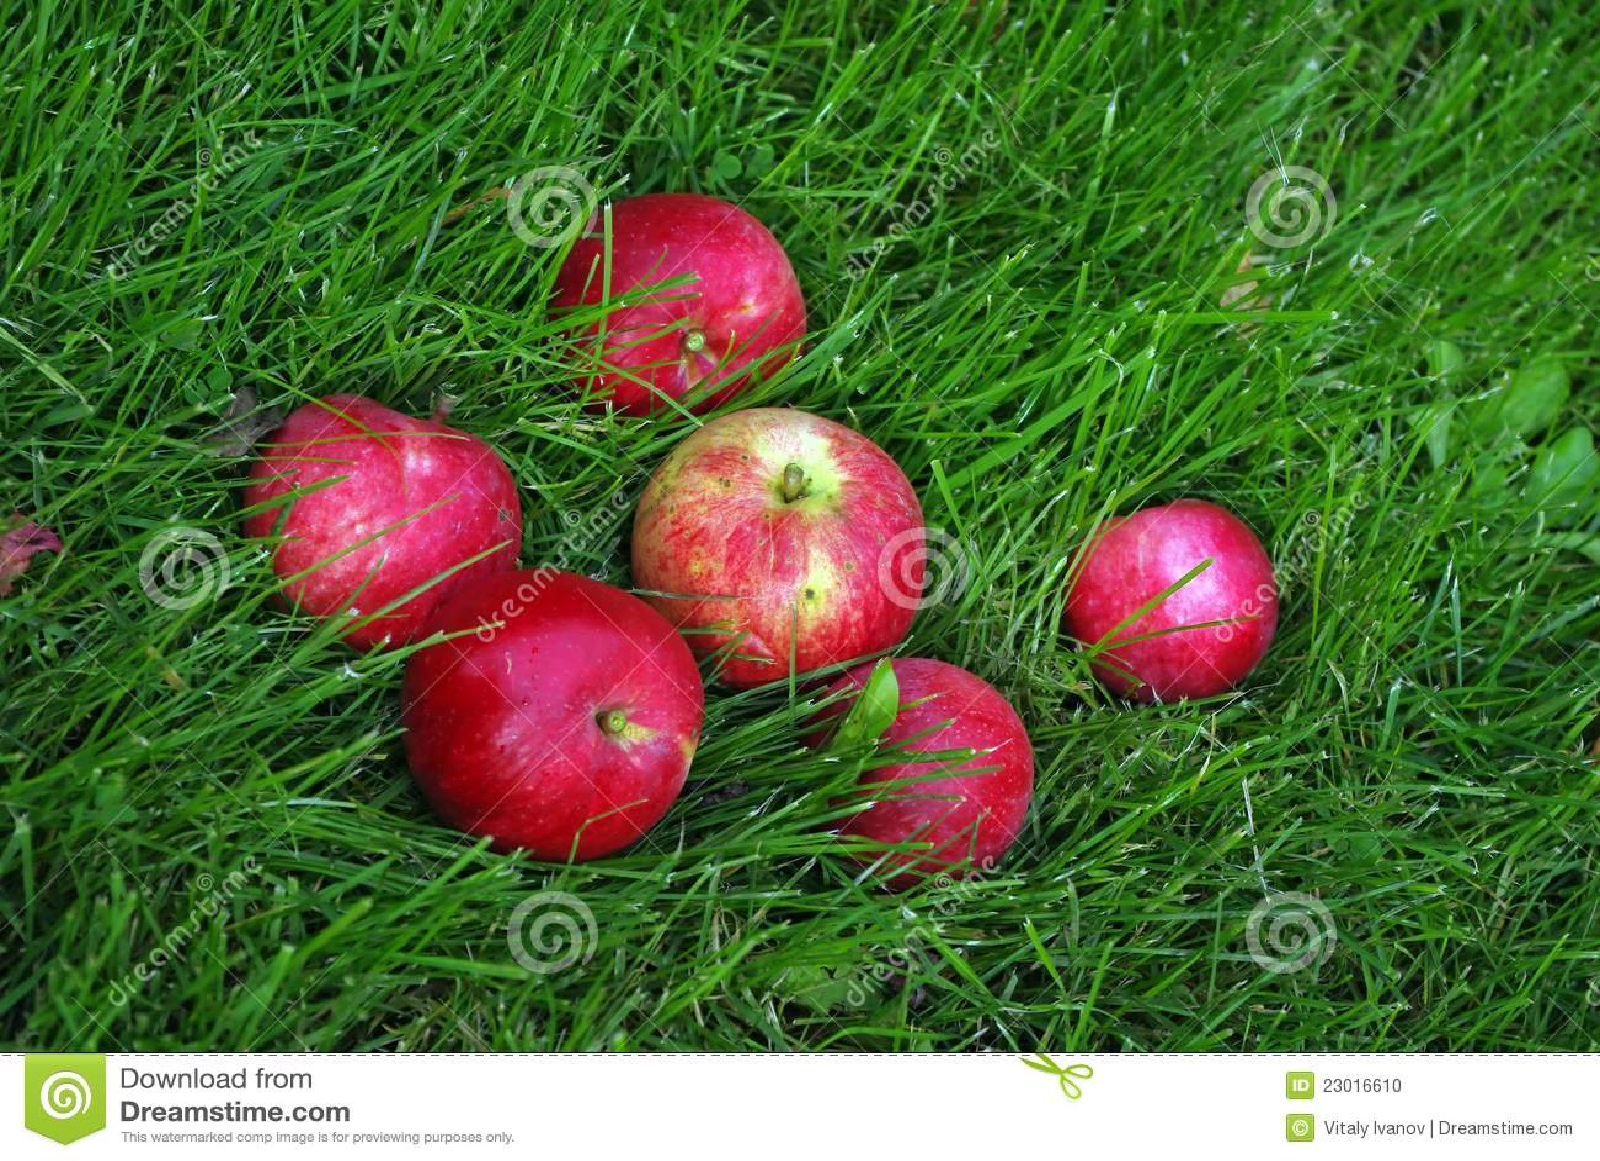 apple fruit background grass - photo #39